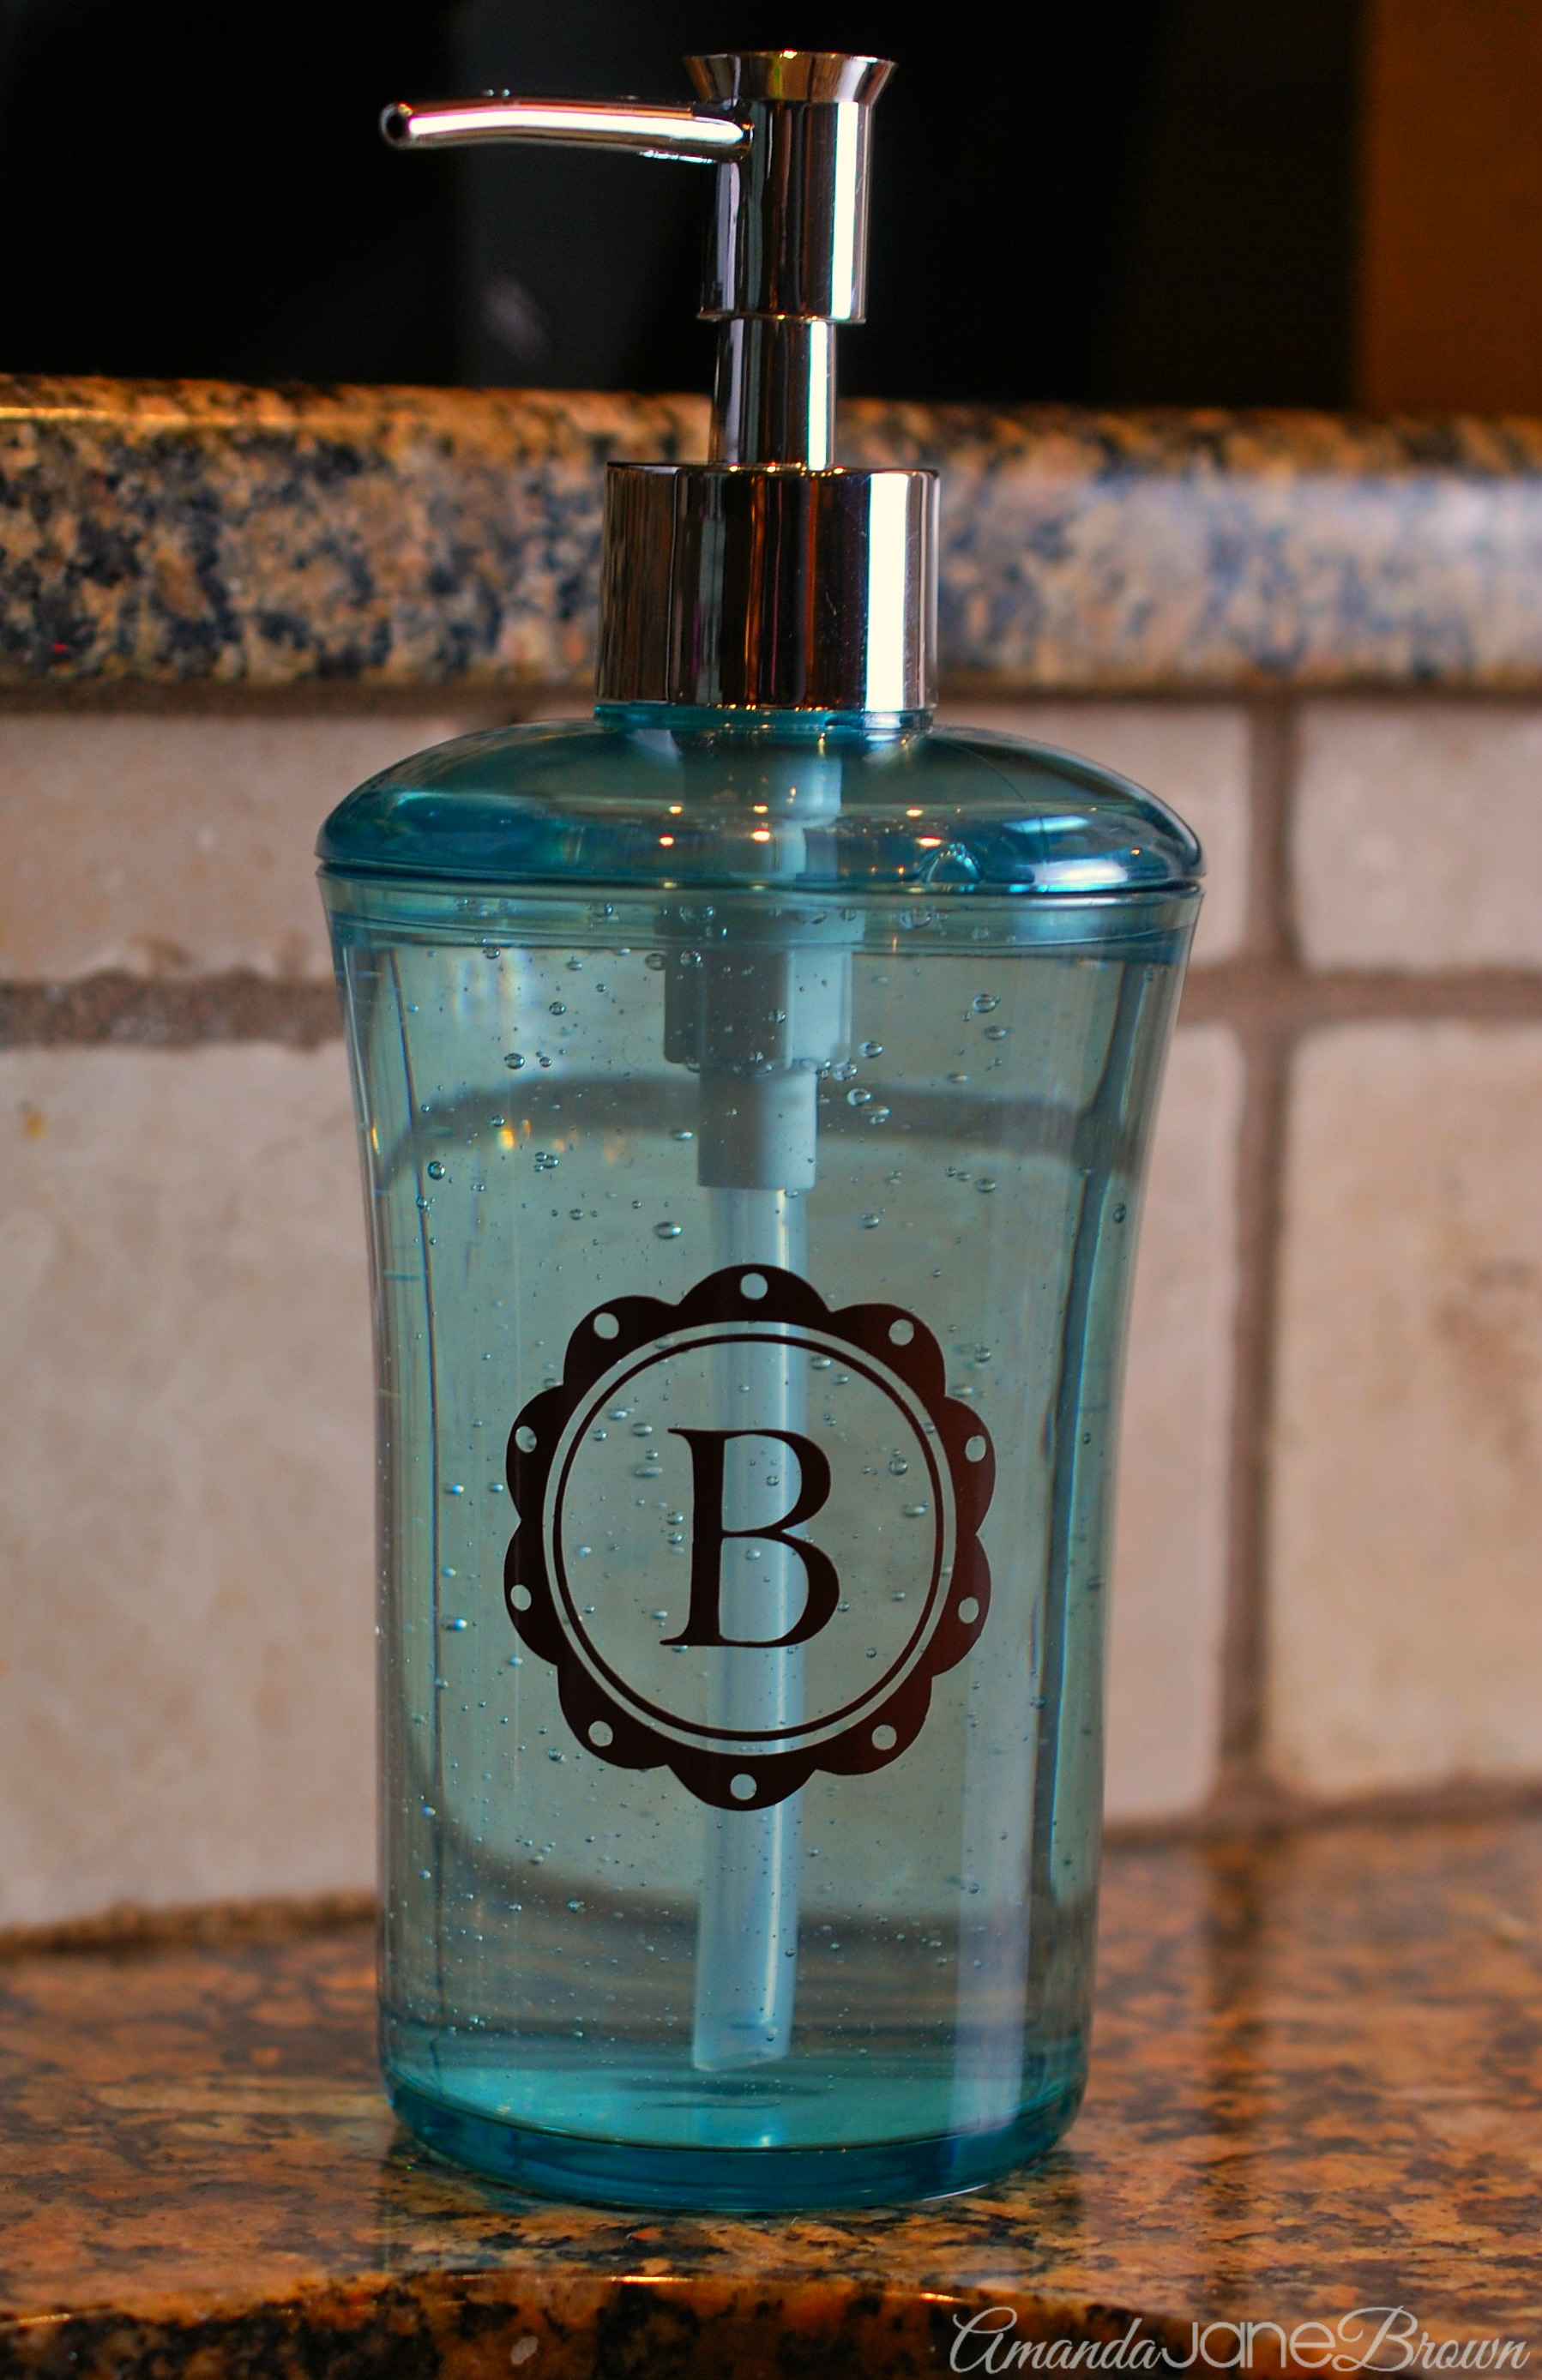 monogrammed soap dispenser-gift idea - amanda jane brown